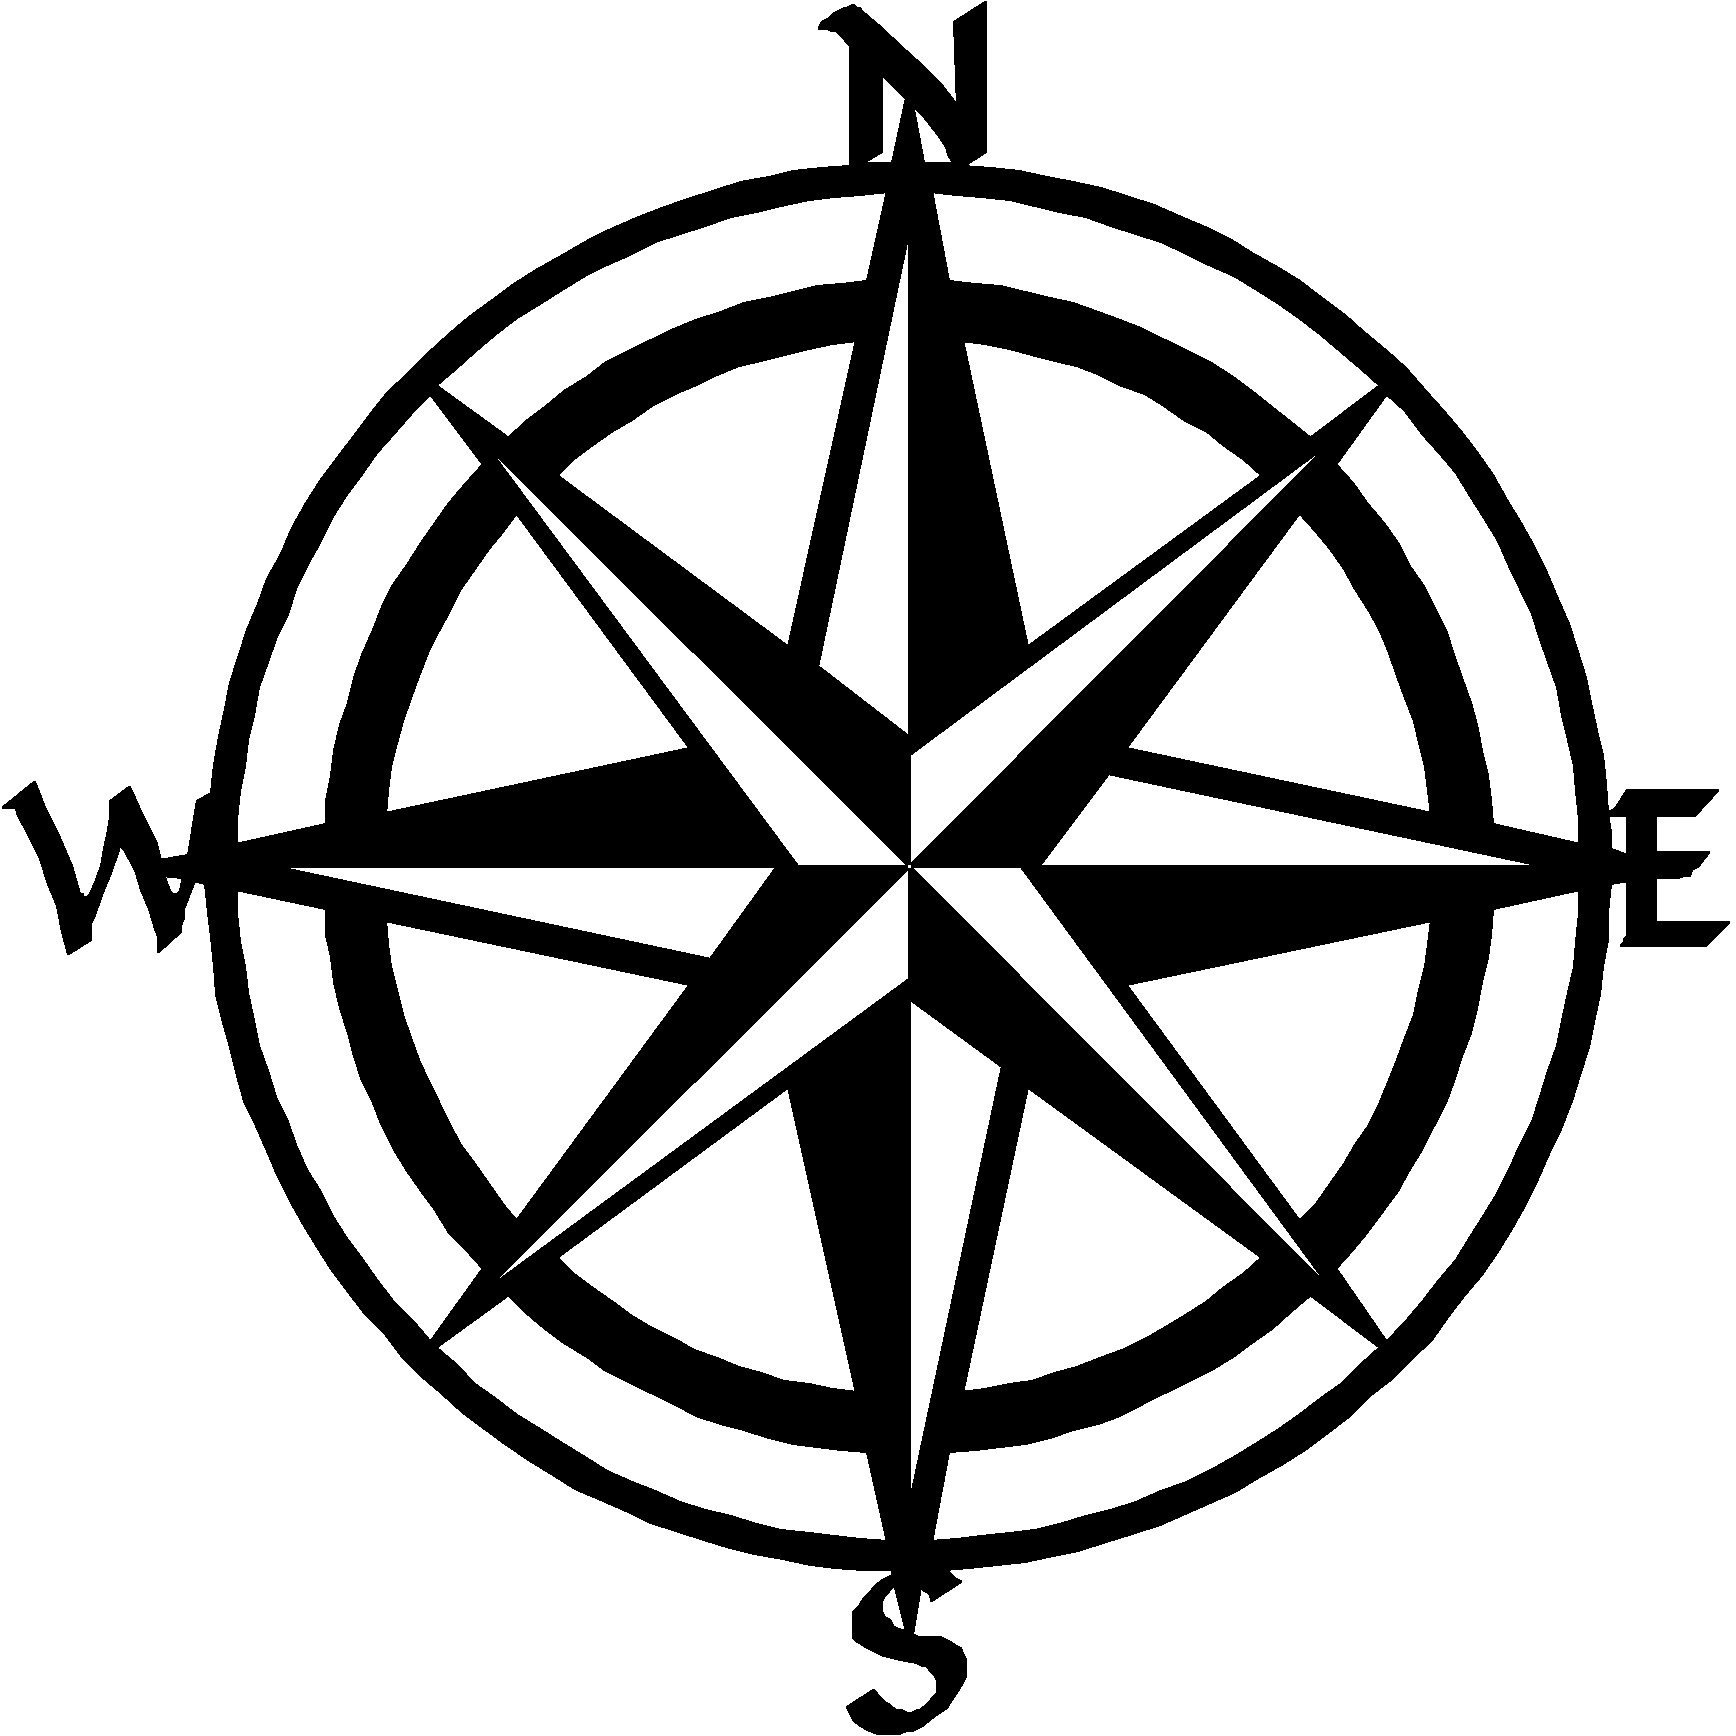 Nautical Compass Drawing At GetDrawings